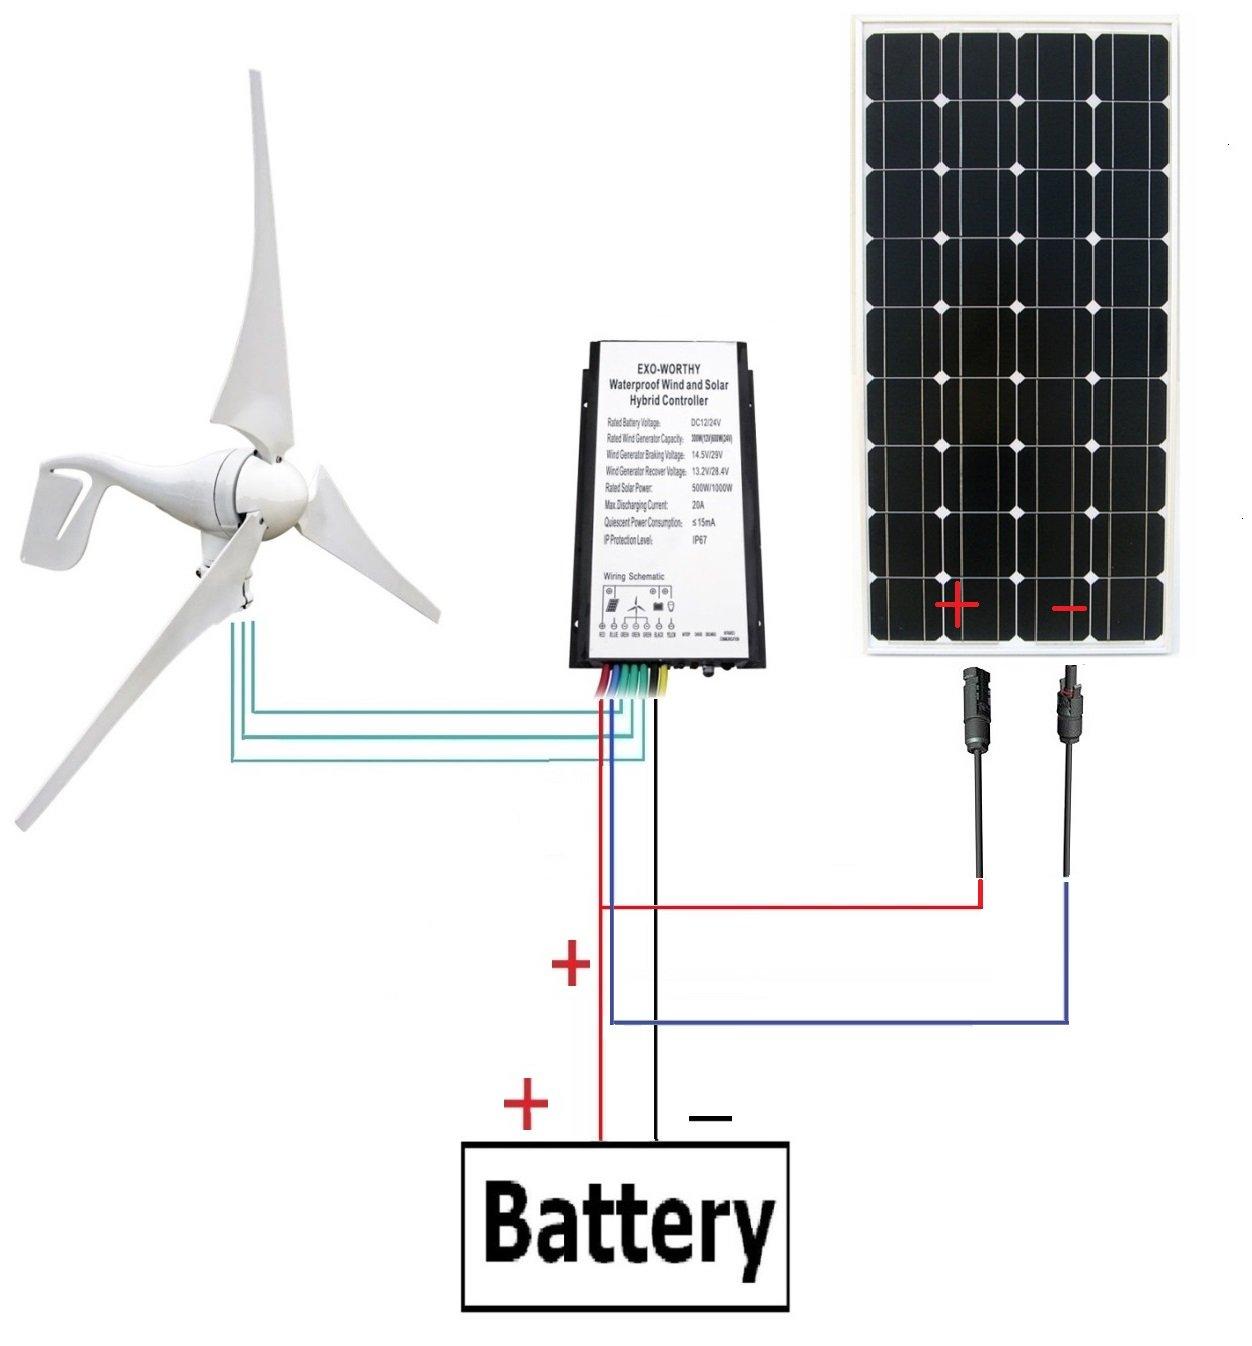 Amazon.com : ECO-WORTHY 400W Wind Turbine Generator + 100W Monocrystalline Solar  Panel for Off Grid 12 Volt Battery Charging : Garden & Outdoor